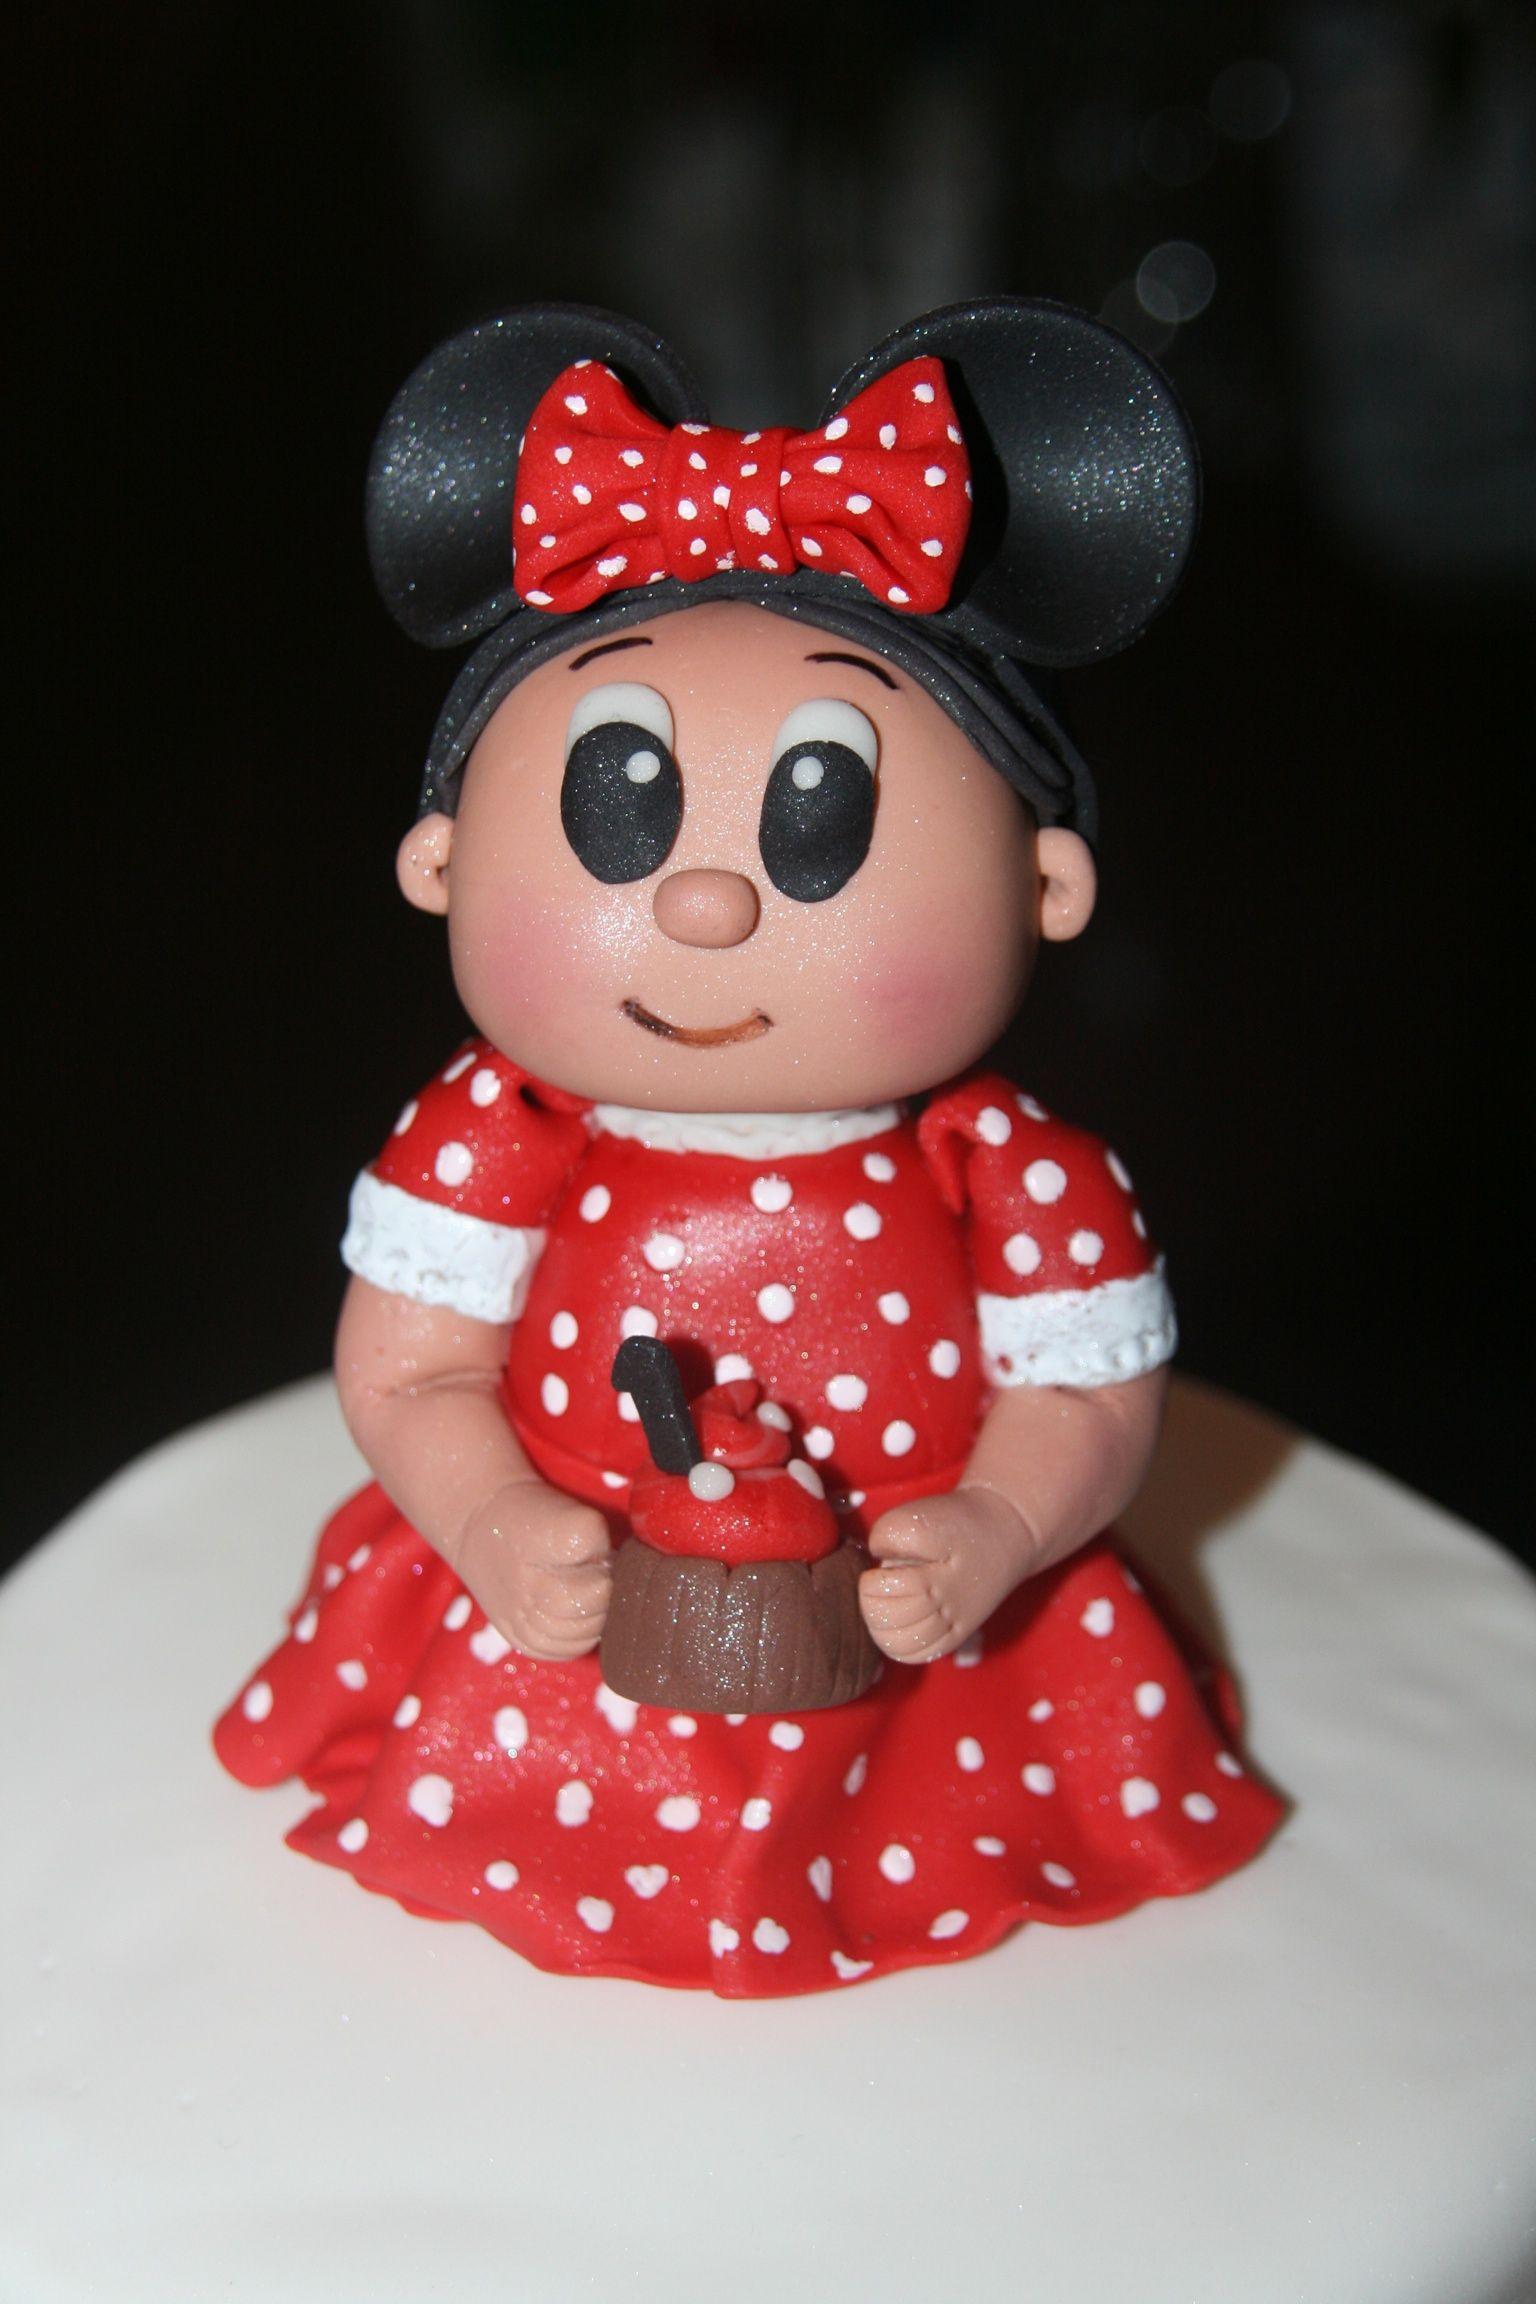 Little minnie girl topper - Cocoabai Cakes